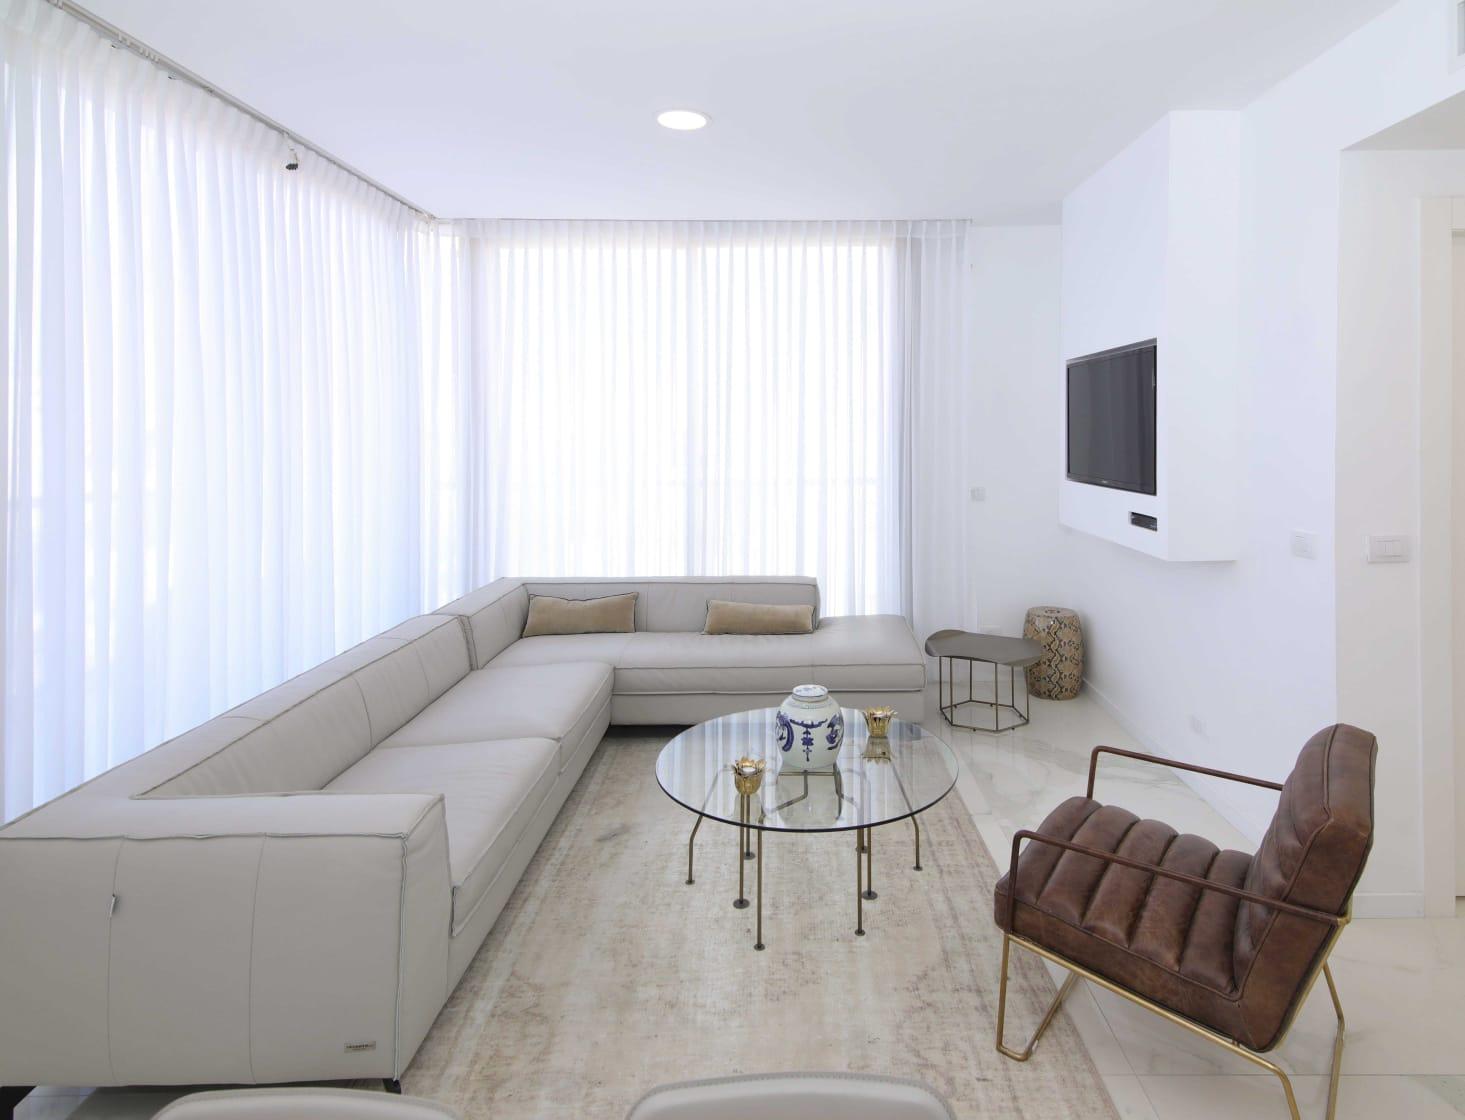 22.Luxury 2BR city Center/Mamilla image 3